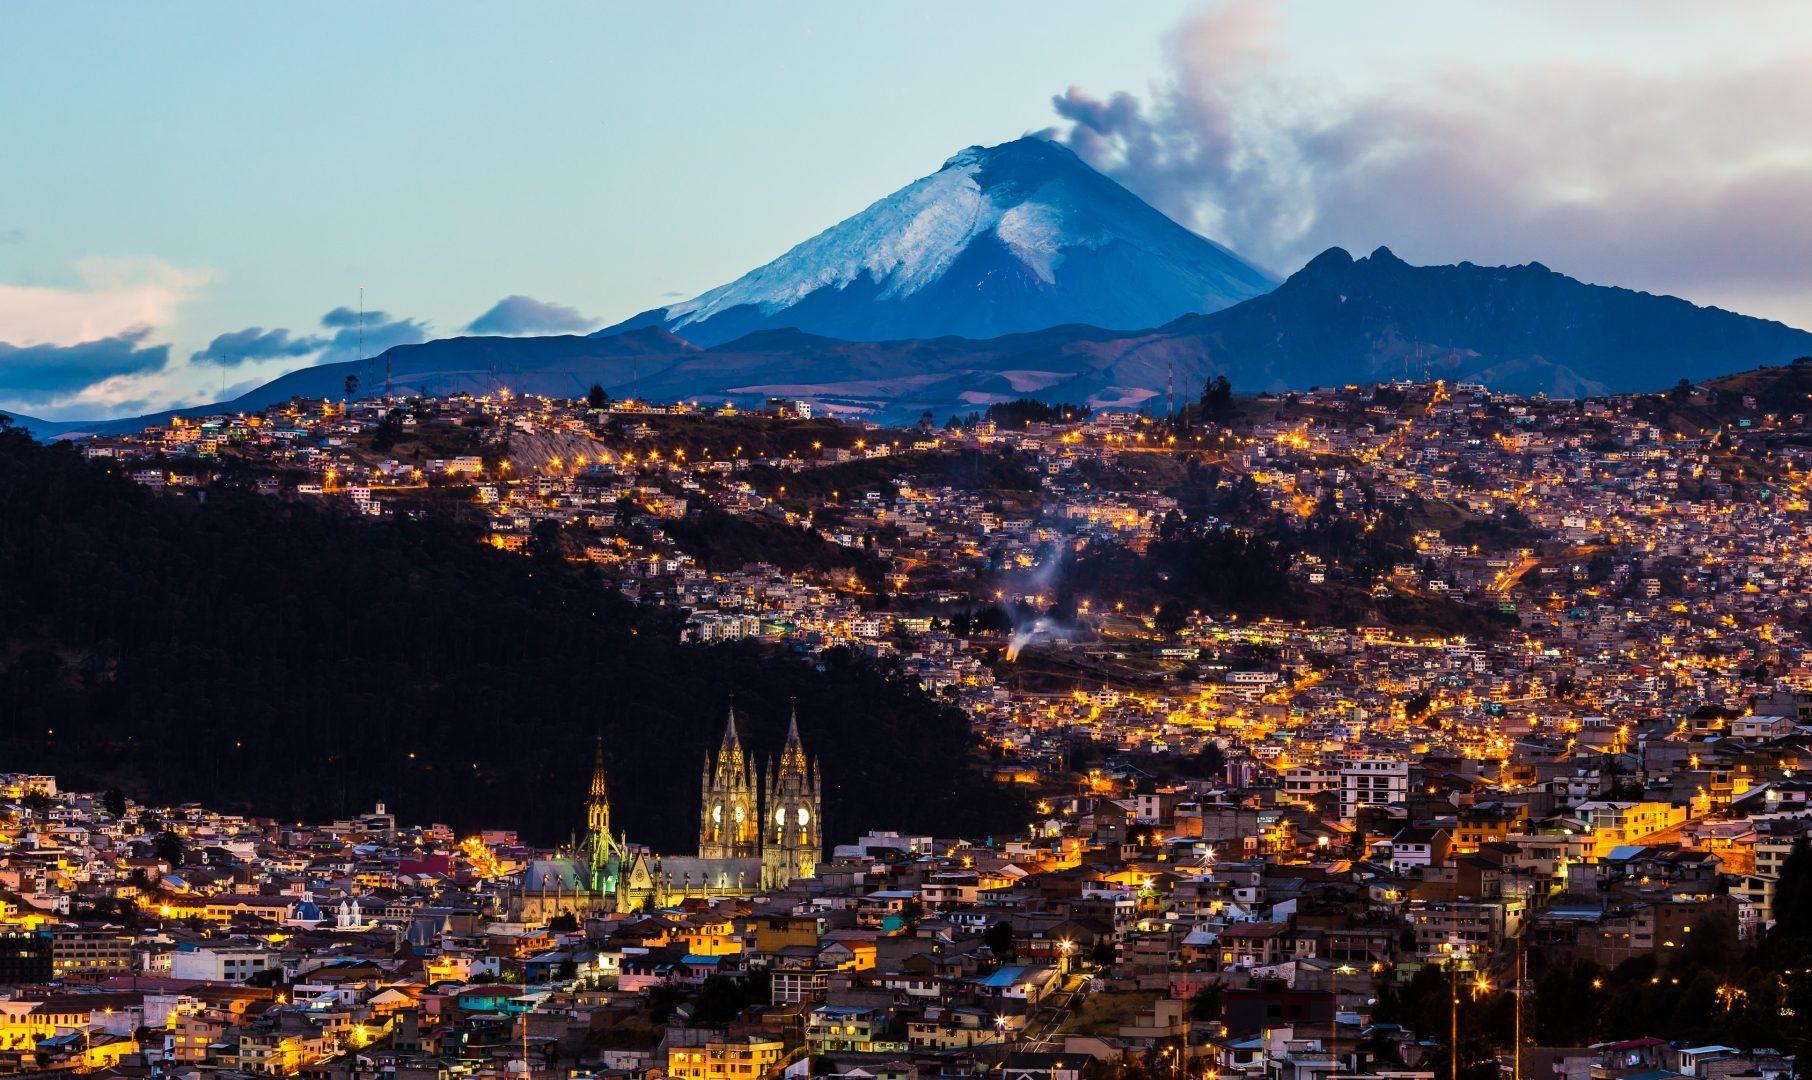 Quito at sunset